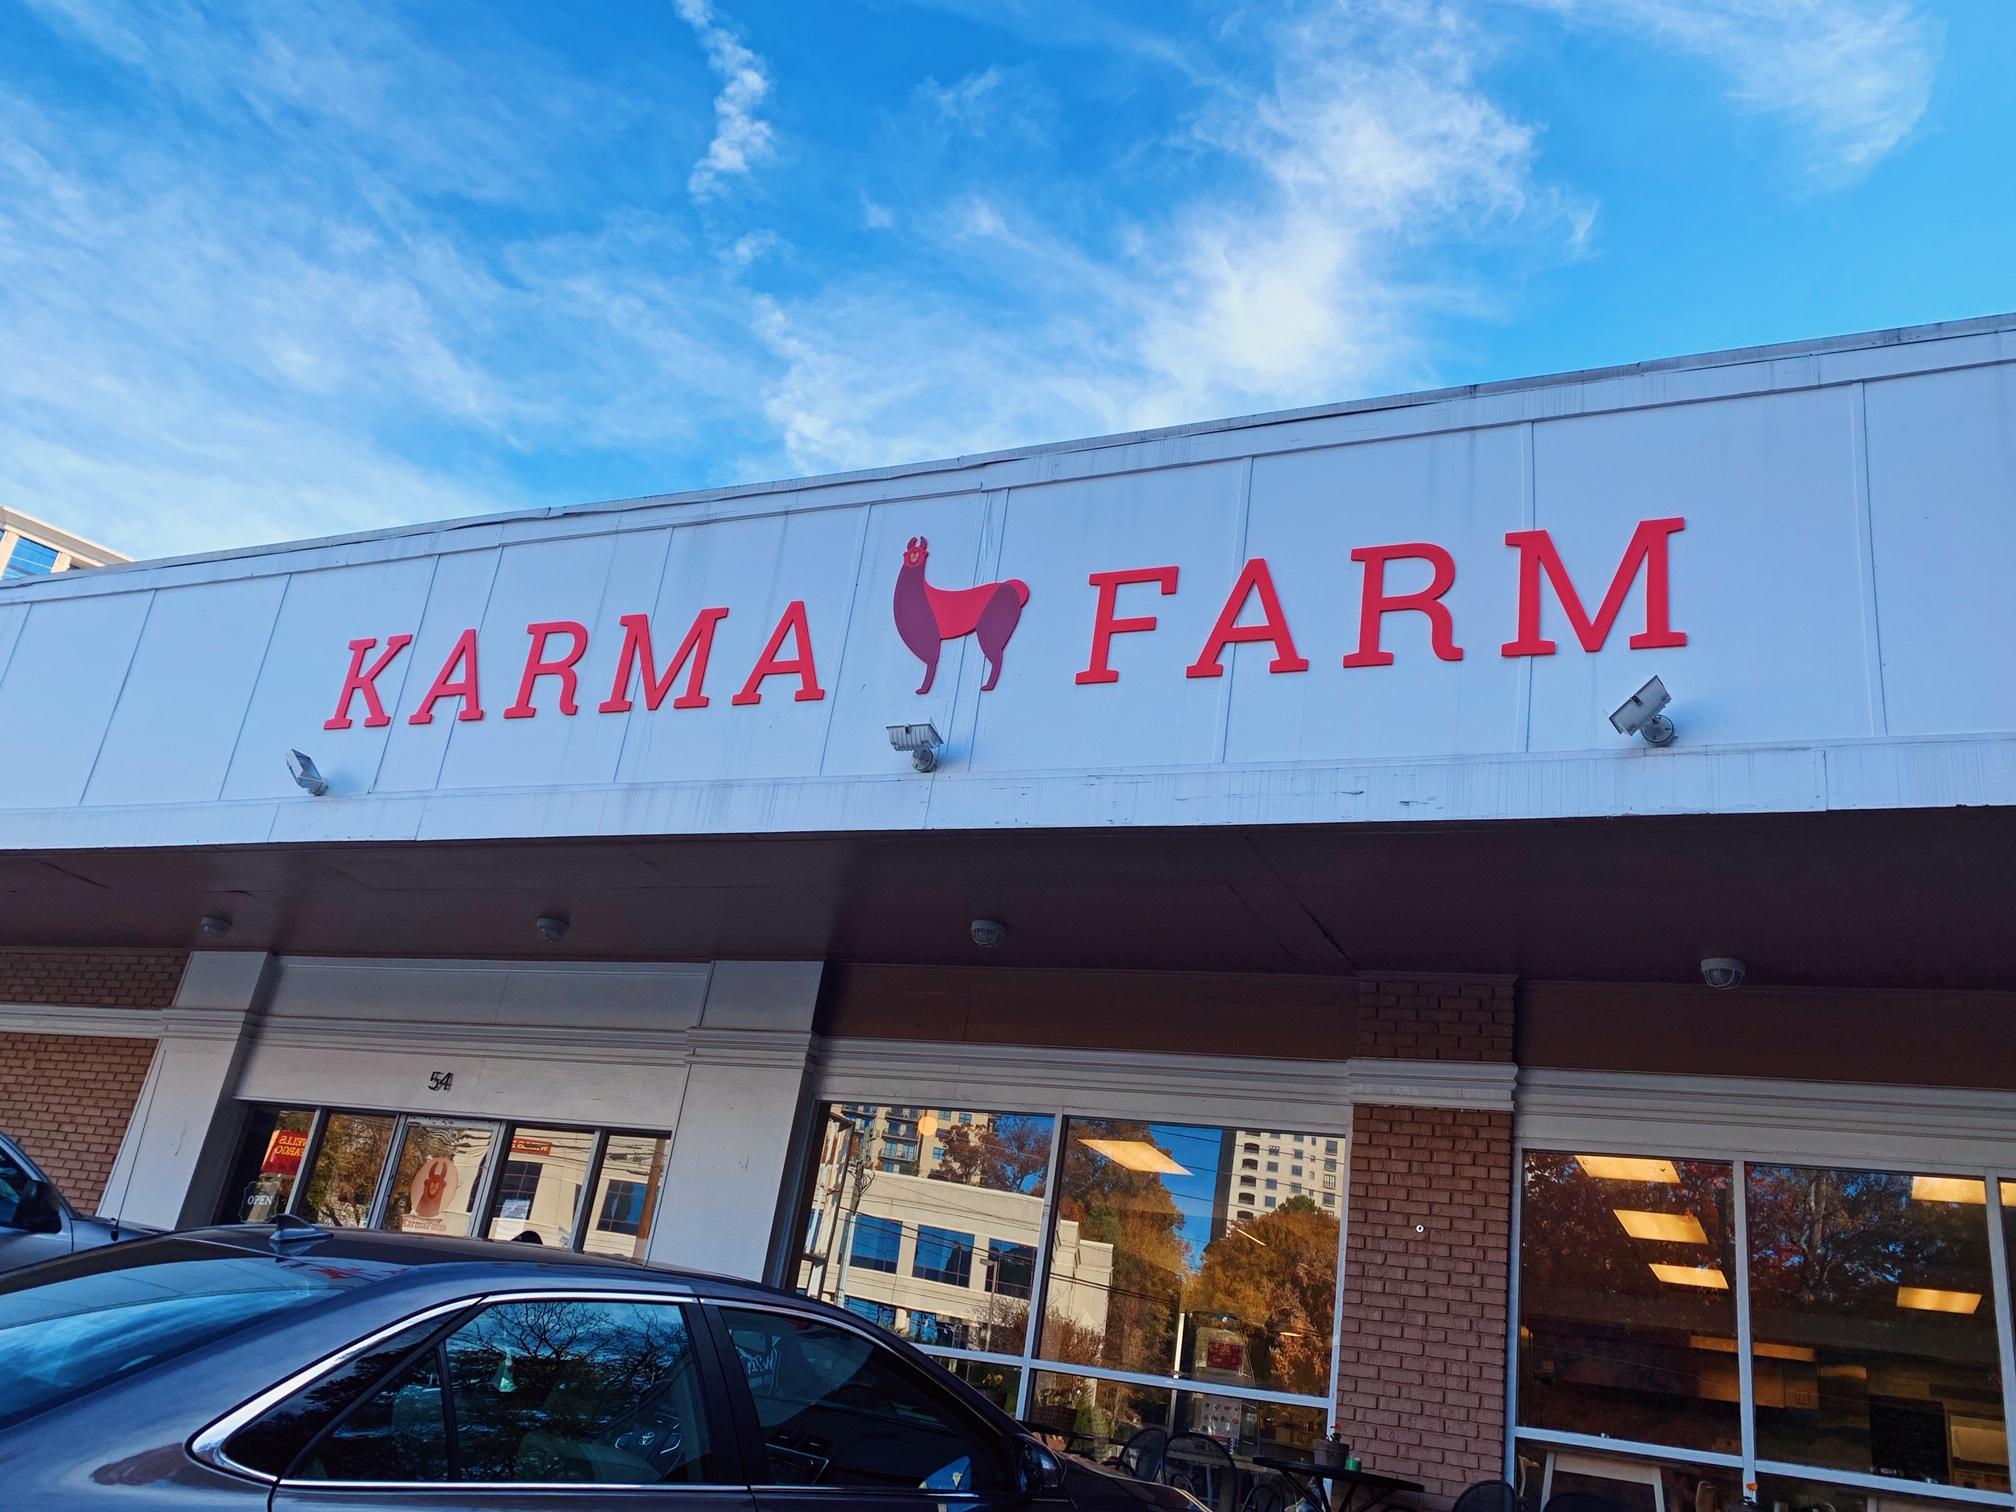 Where To Eat Gluten Free In Atlanta At Karma Farm America S First Certified Gluten Free Fast Casual Restaurant Bakery Kiwi The Beauty Kiwi The Beauty